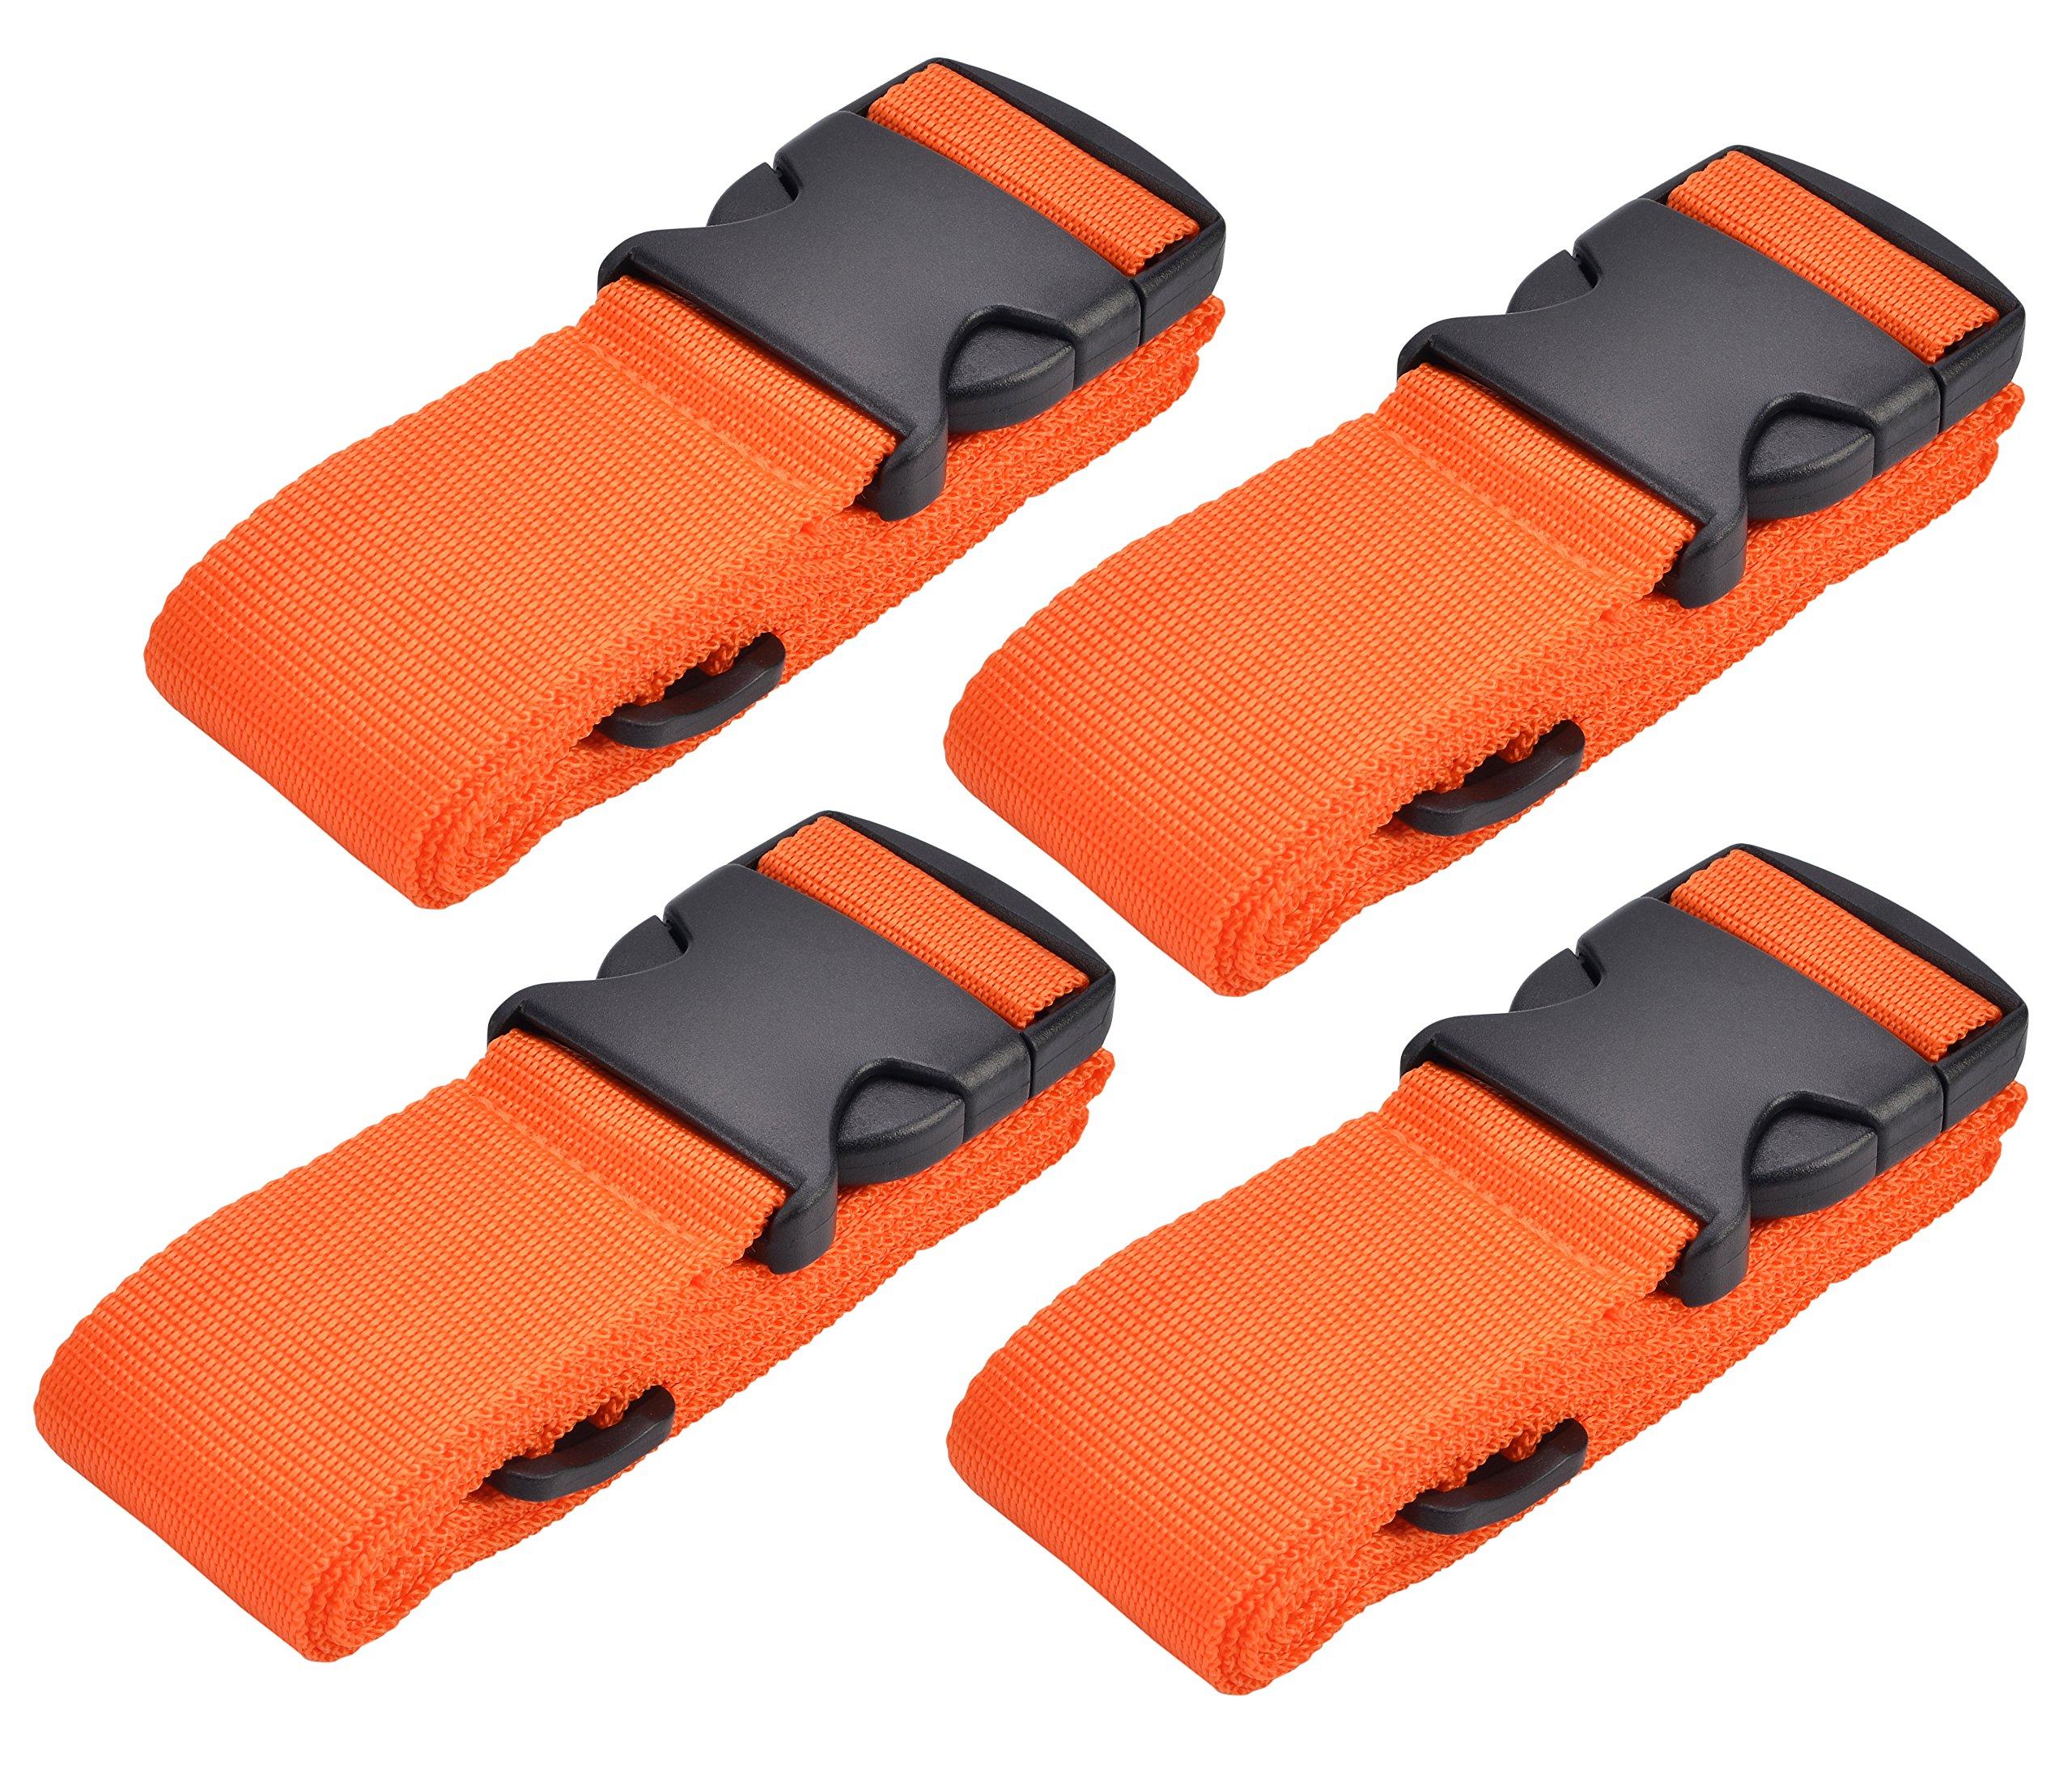 WeBravery Adjustable Luggage Strap Suitcase Belt Bag Straps Travel Accessories, Orange, 4 Piece